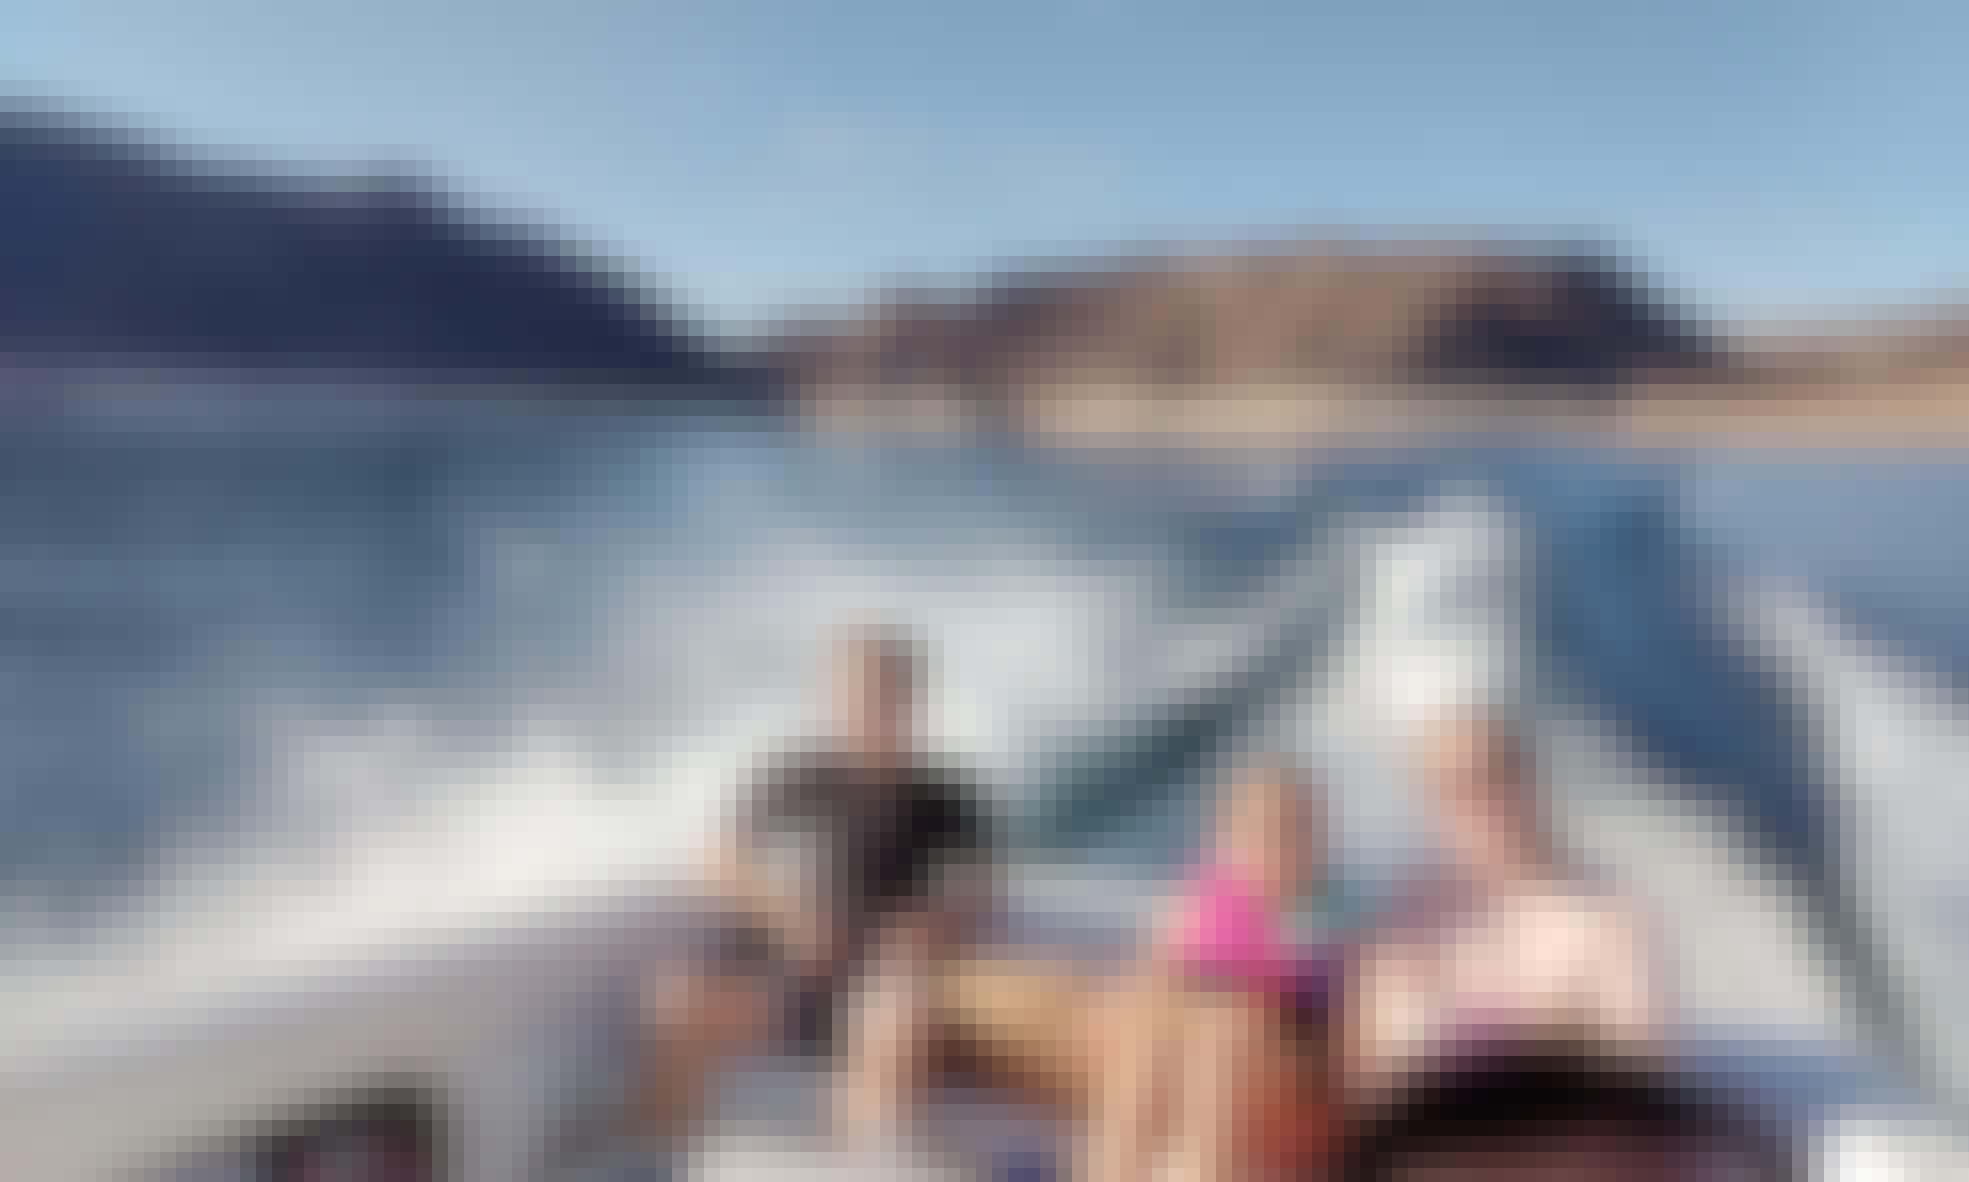 Tige 21i Power Boat Rental on Lake Mead! One day minimum rental